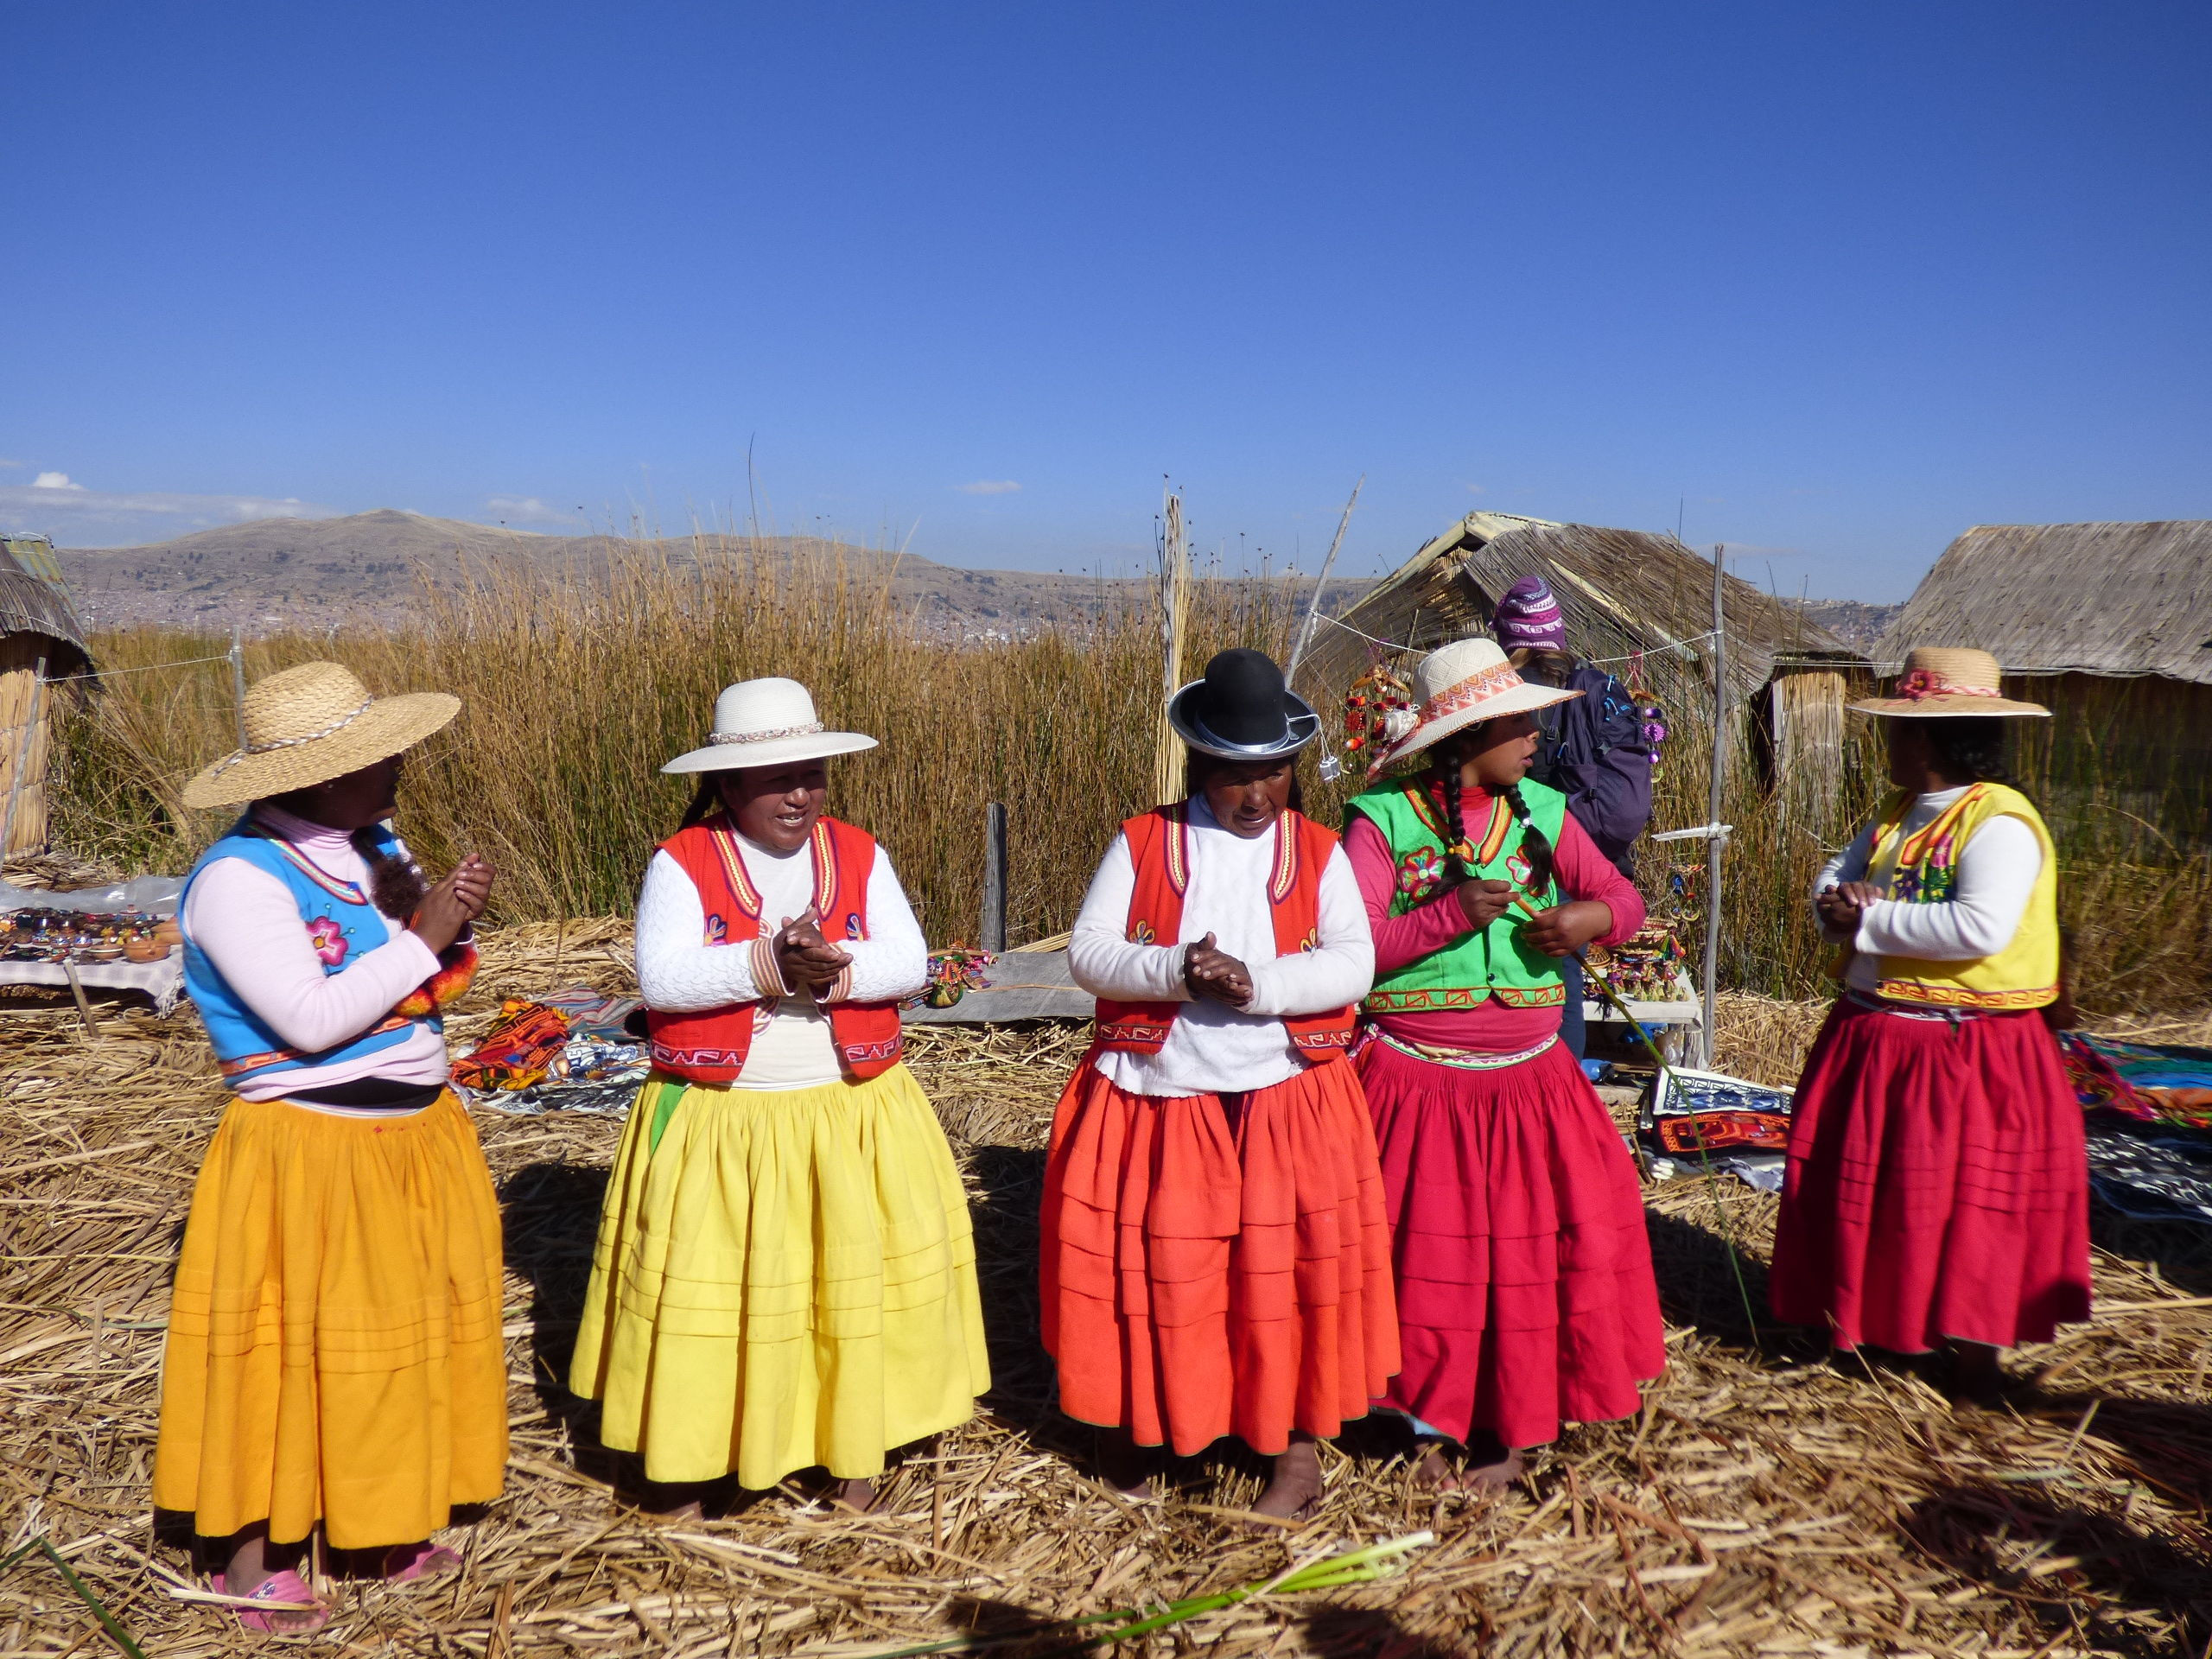 Sfeerimpressie Rondreis Peru: Kleurrijk Peru